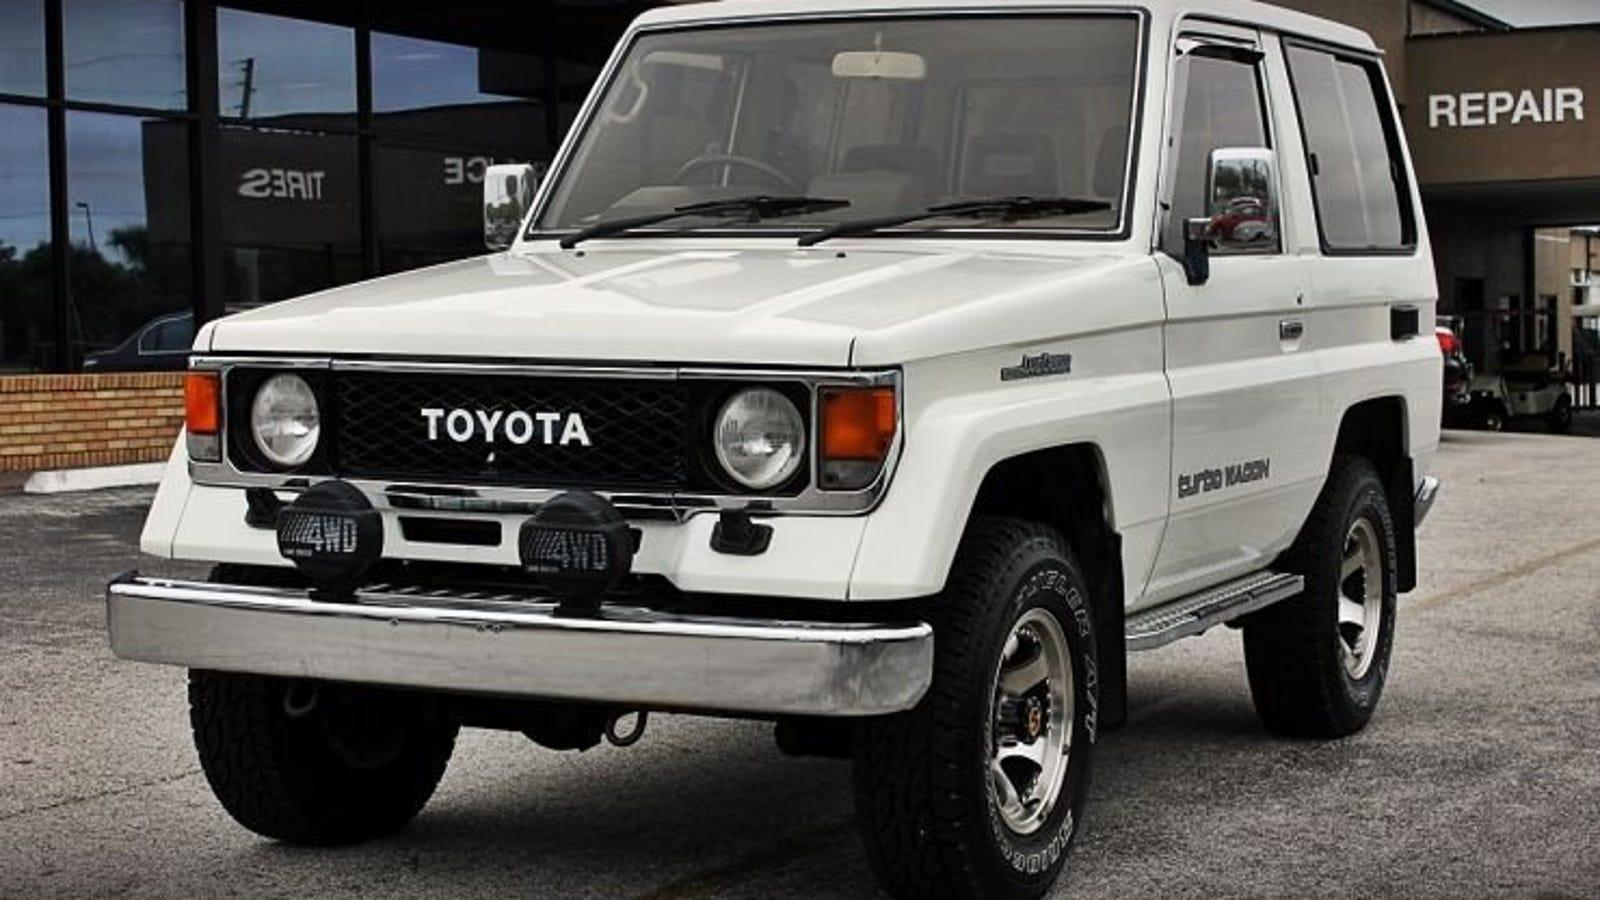 Npocp 1987 Toyota Land Cruiser J70 2 Door Turbo Diesel 19 975